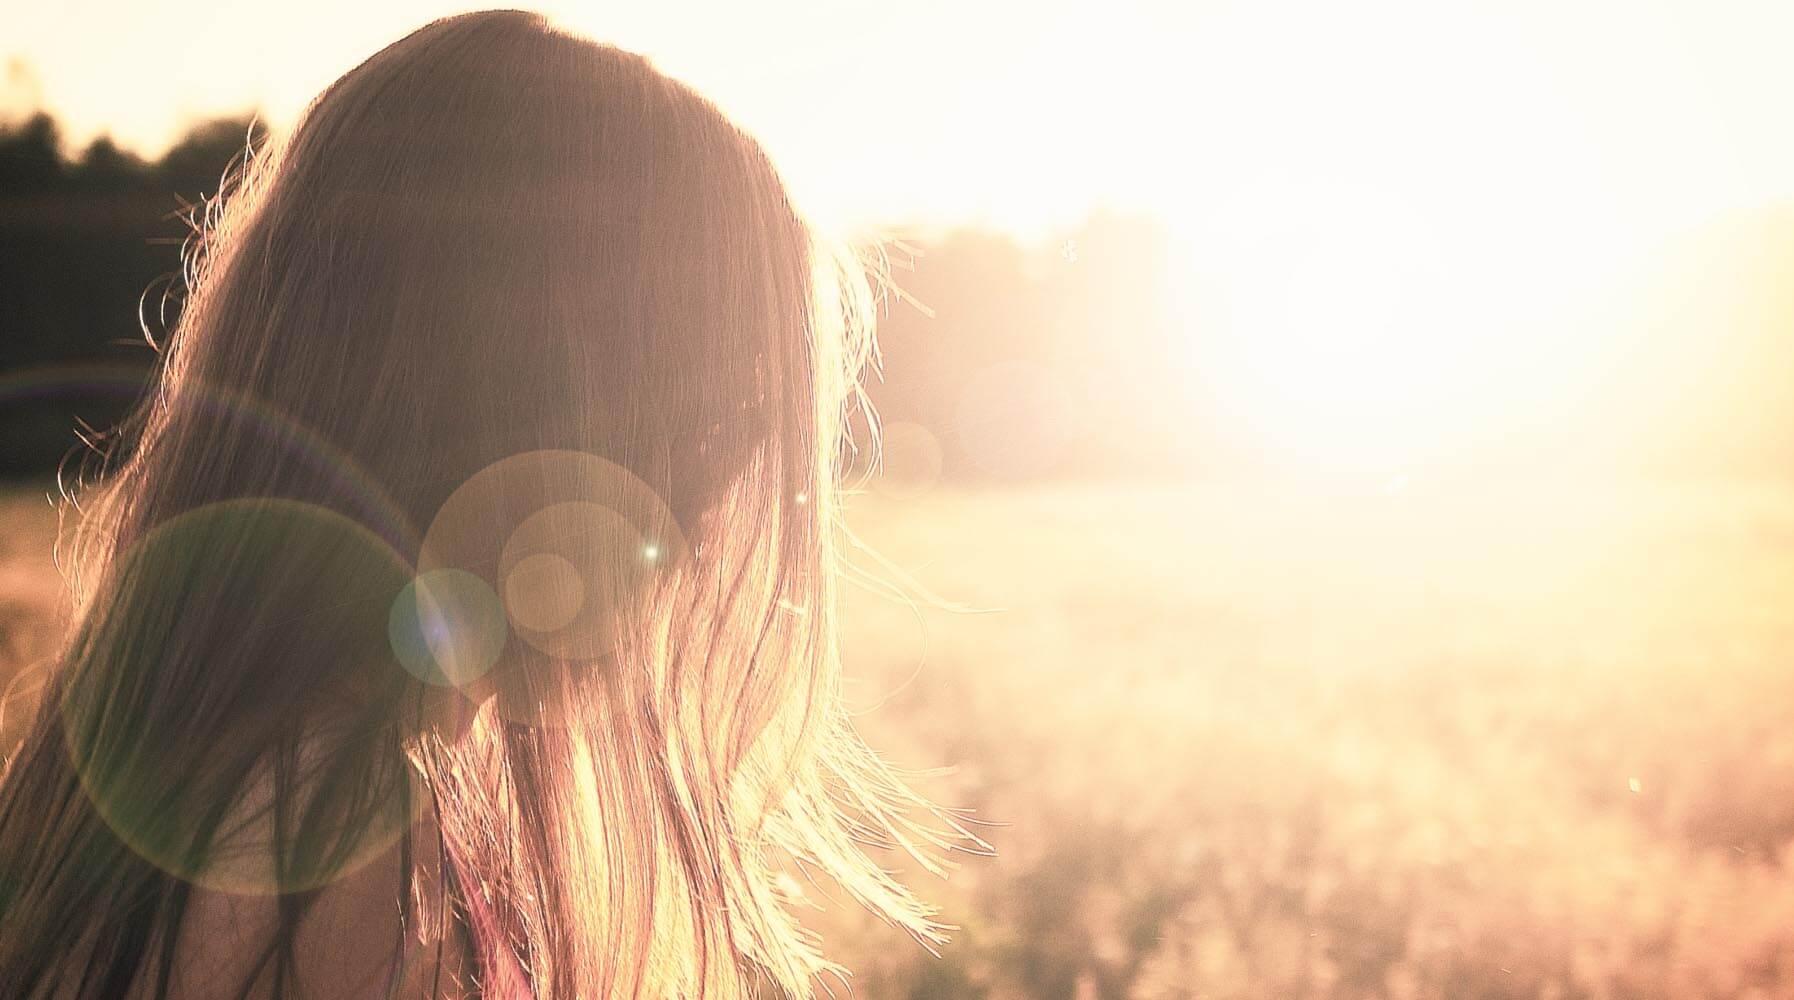 The way of Simply Stillness